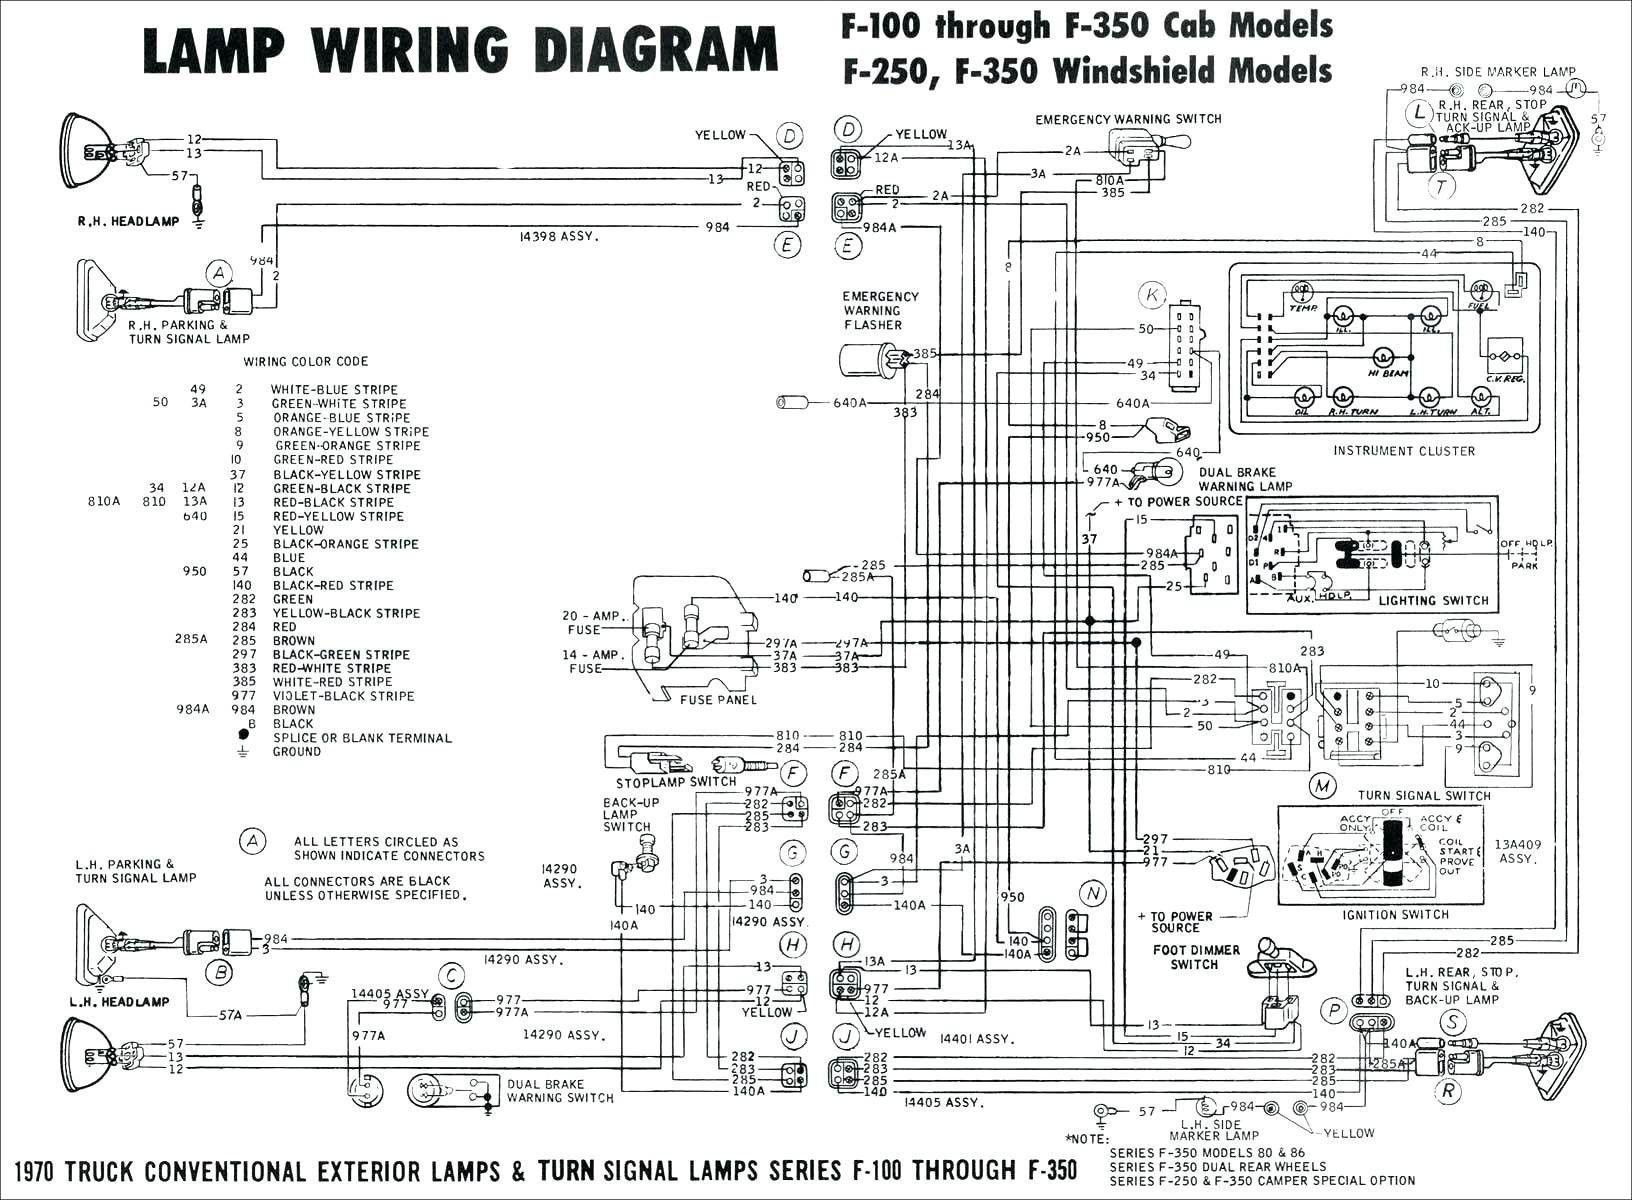 2002 Ford Explorer Trailer Wiring Diagram